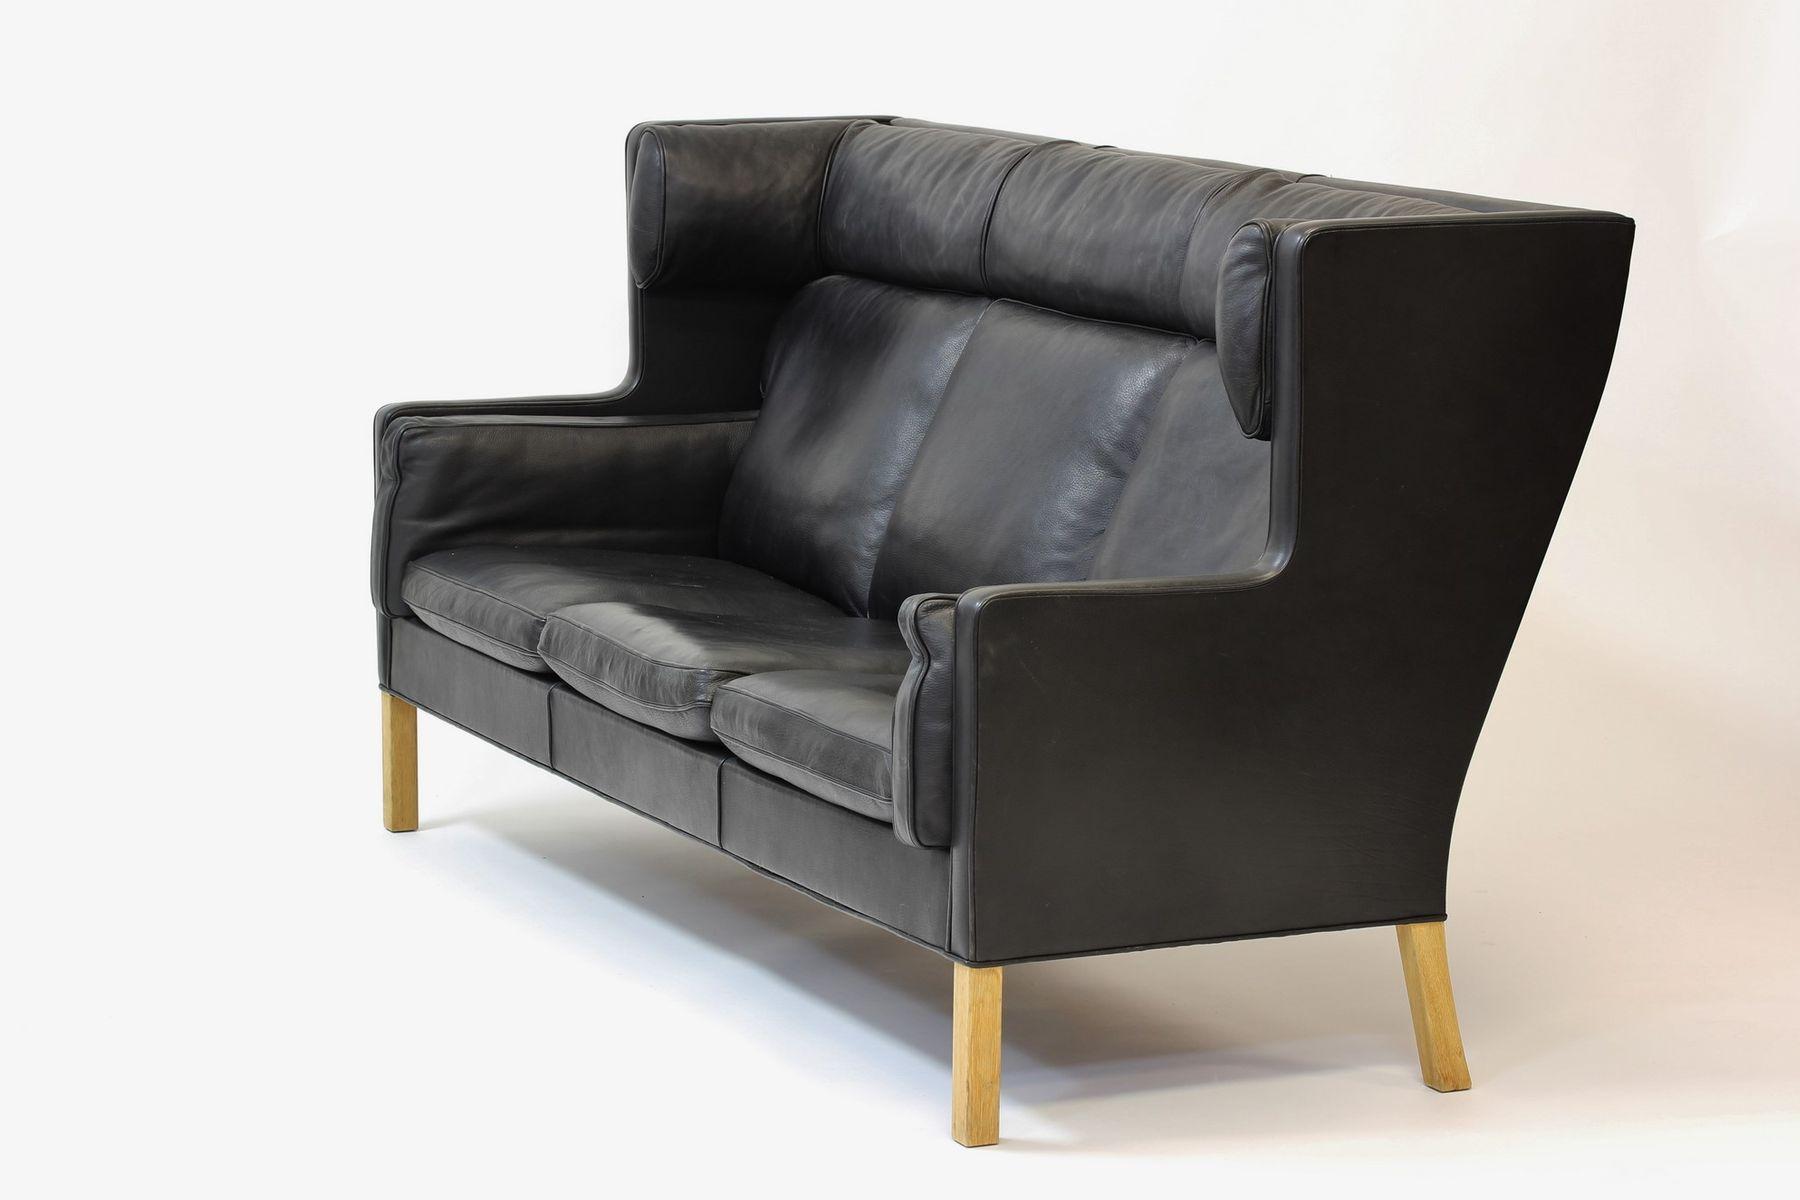 coup sofa von b rge mogensen f r fredericia 1960er bei. Black Bedroom Furniture Sets. Home Design Ideas